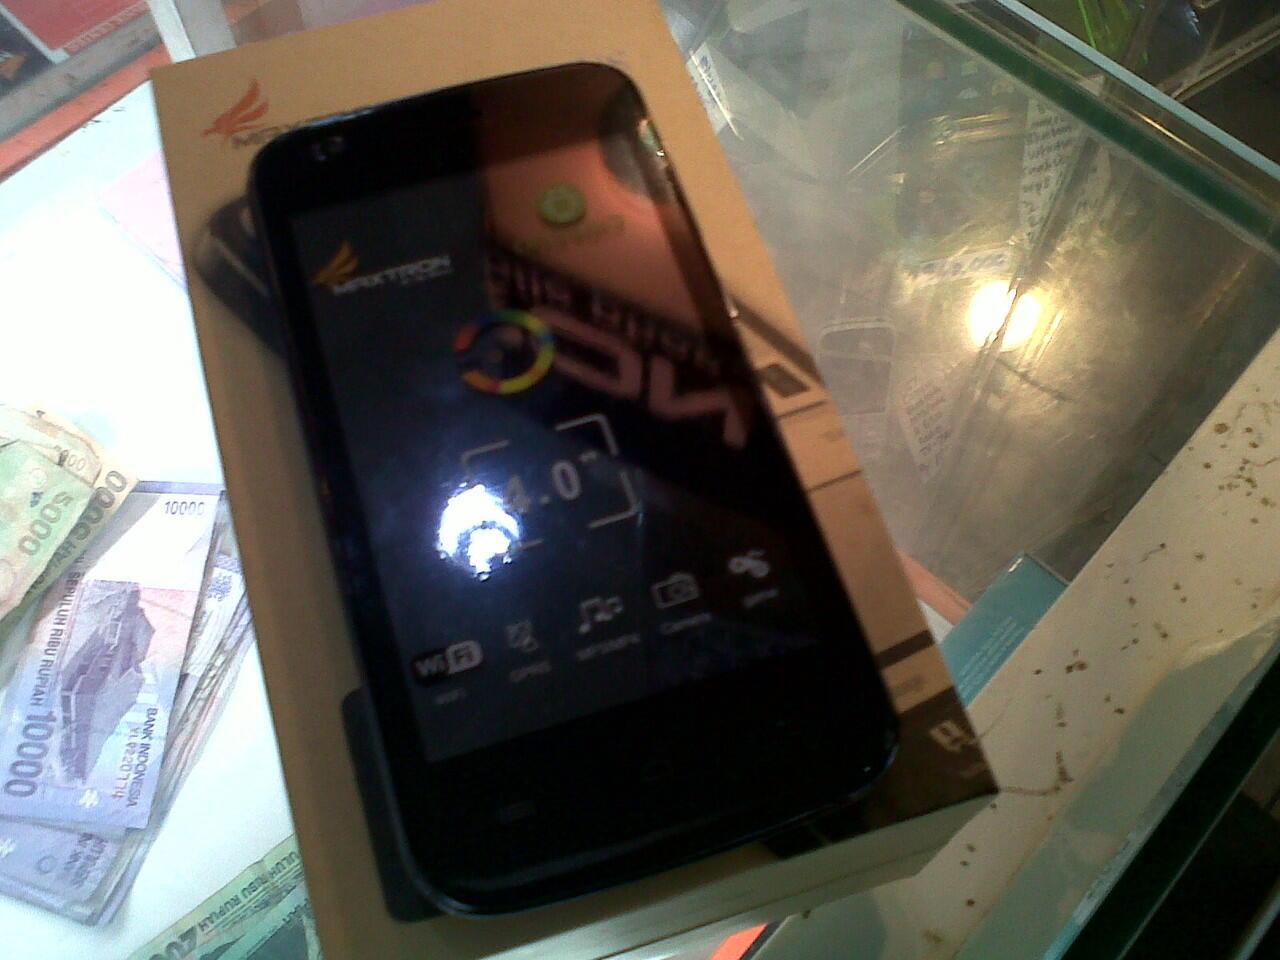 Terjual Hp Android Murahkualitas Okmaxtron Venus Kaskus